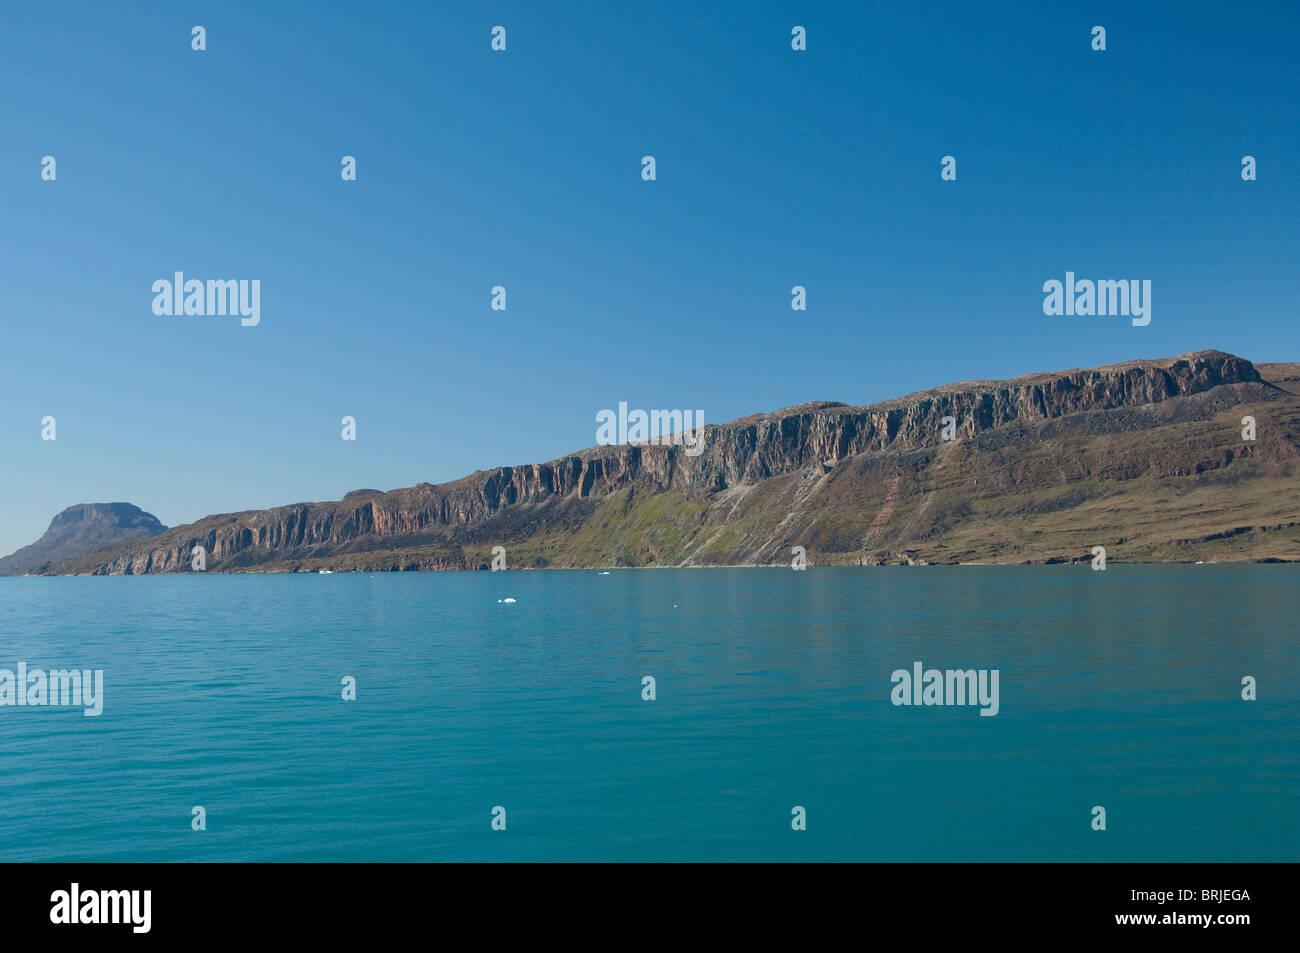 Greenland, Erik's Fjord (aka Eriksfjord). Scenic Greenlandic fjord between Qaqortoq and Narsarsuaq. - Stock Image